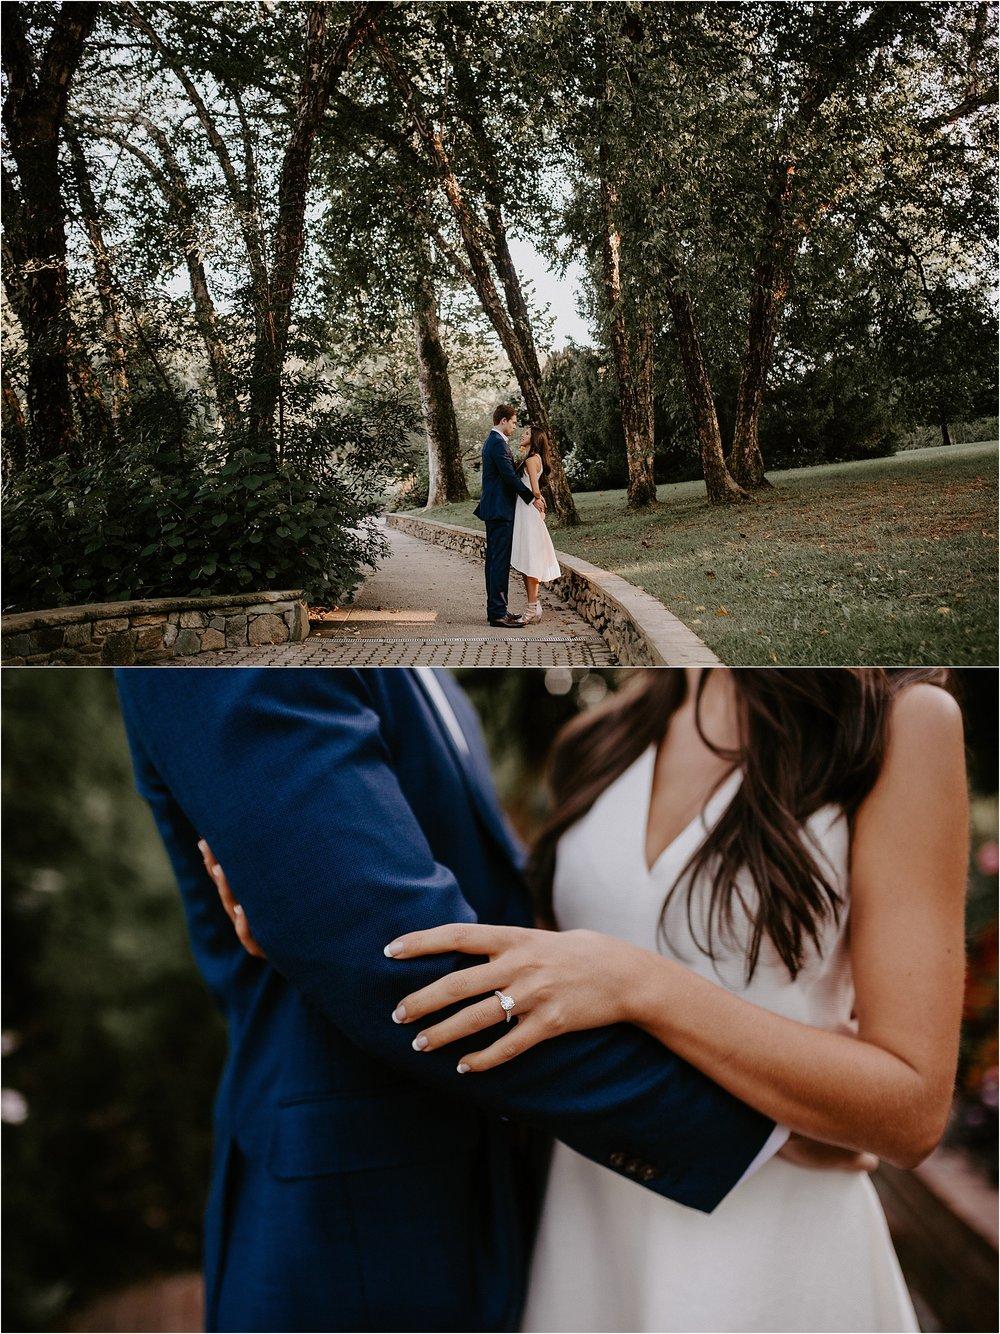 Sarah_Brookhart_Baltimore_Wedding_Photographer_0019.jpg